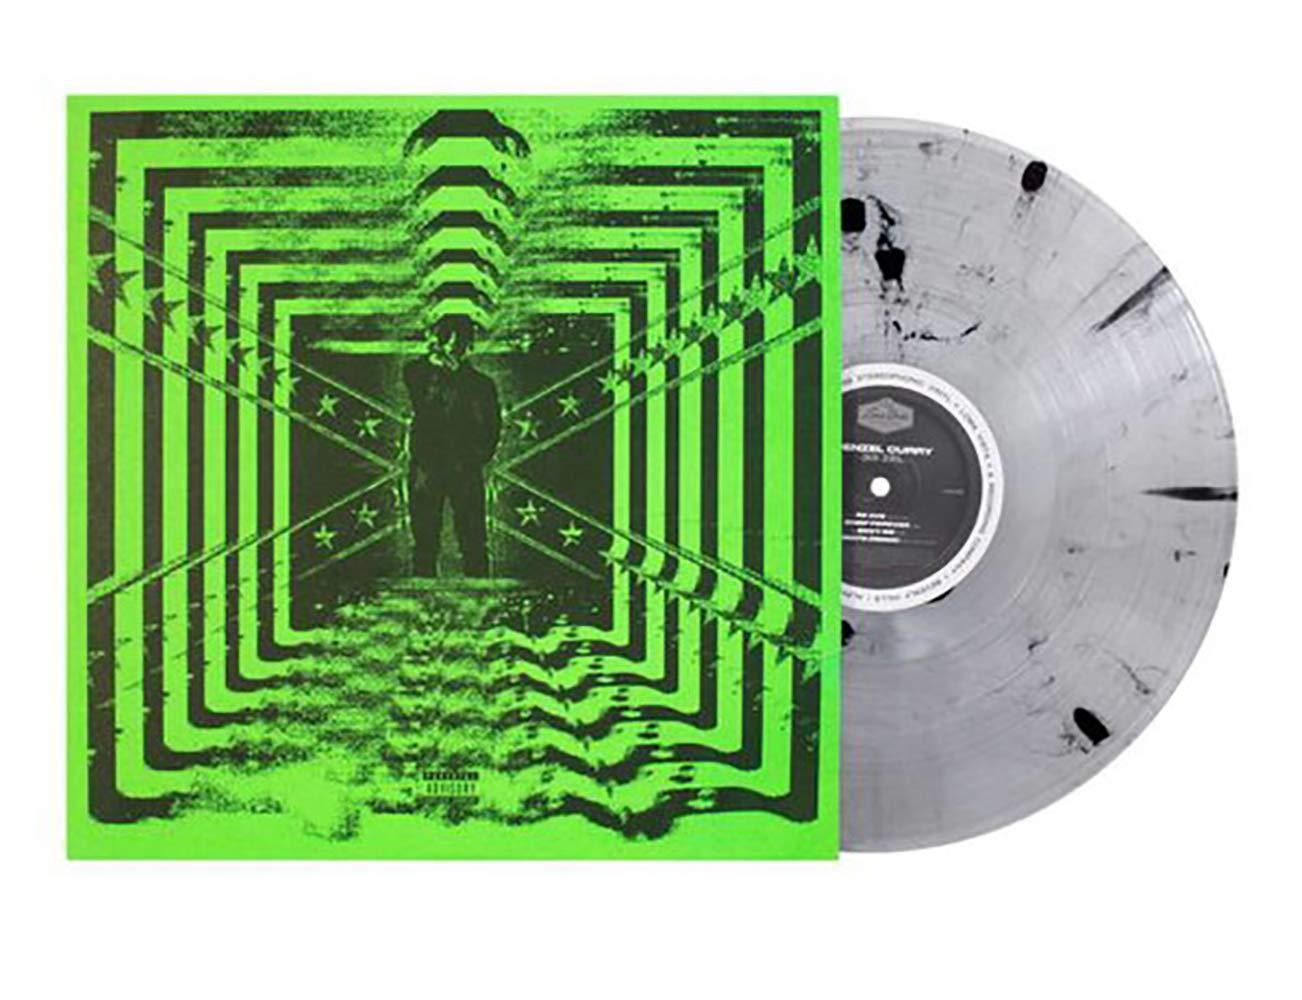 32 Zel - Exclusive Limited Edition Salt & Pepper Colored Vinyl LP by Loma Vista